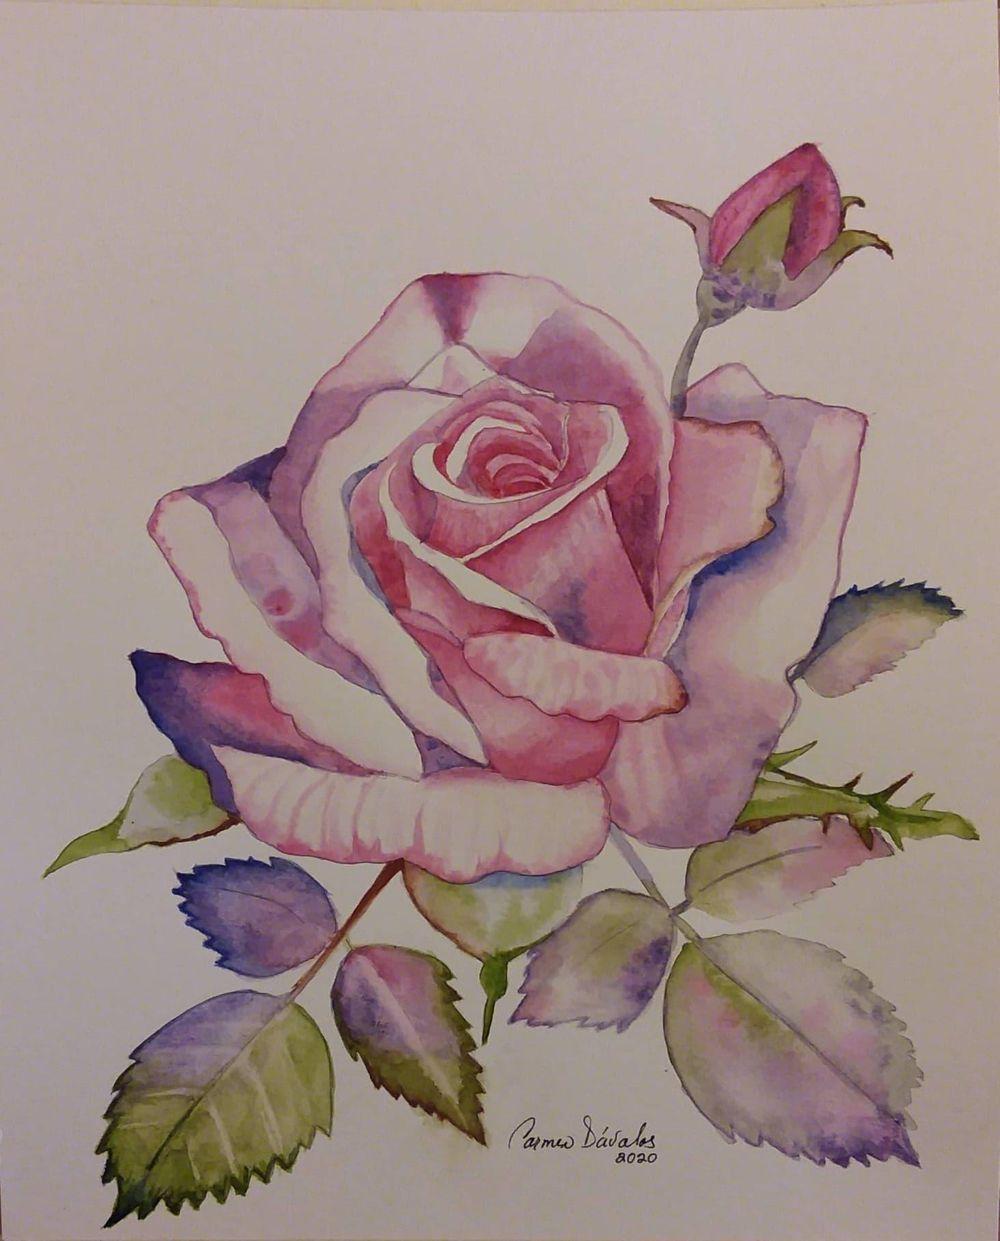 Rose. Carmen Davalos - image 1 - student project